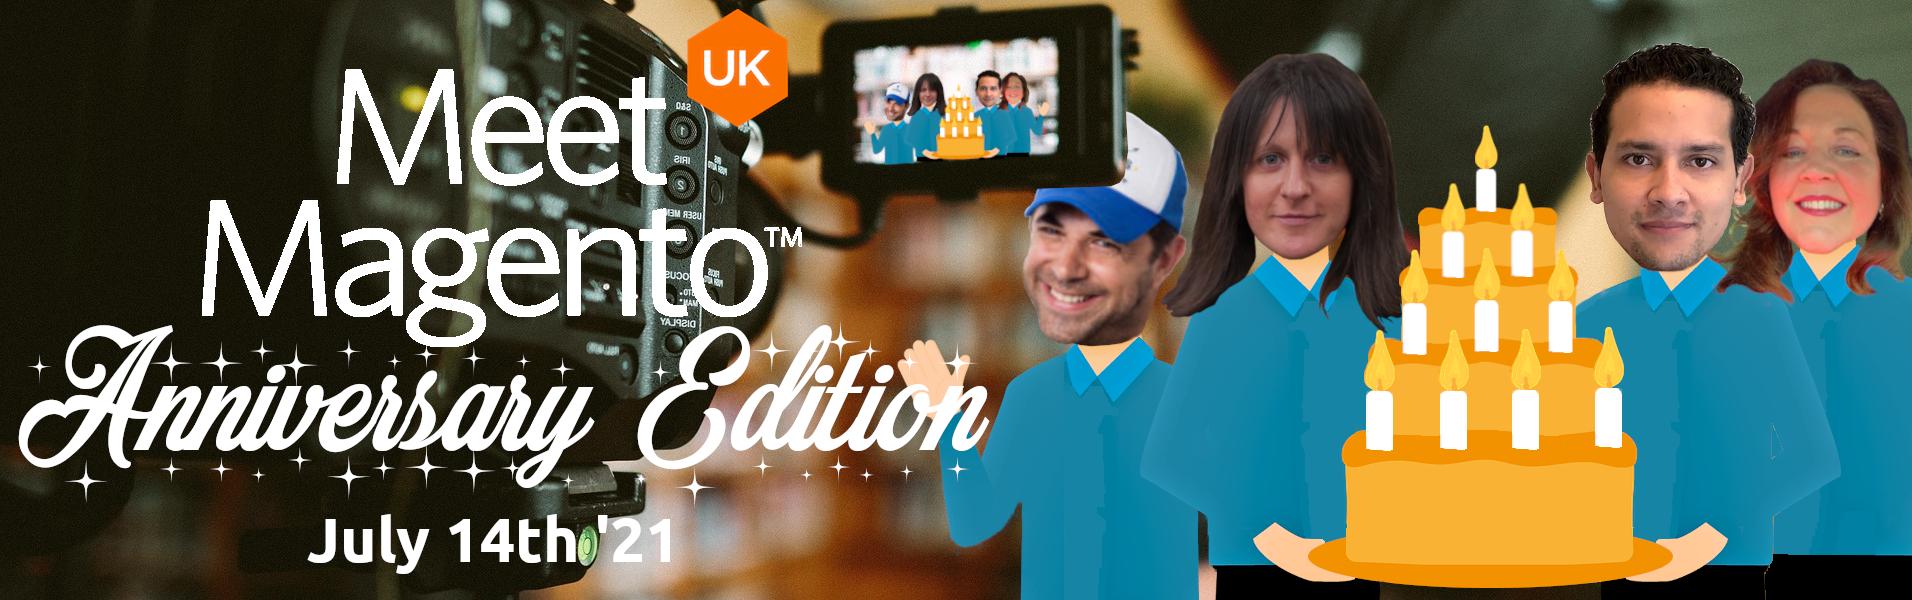 Meet Magento UK '21 - Chloe Thomas, Rafael Corrêa Gomes, Itay Vladomirsky & Sharon Lambert.